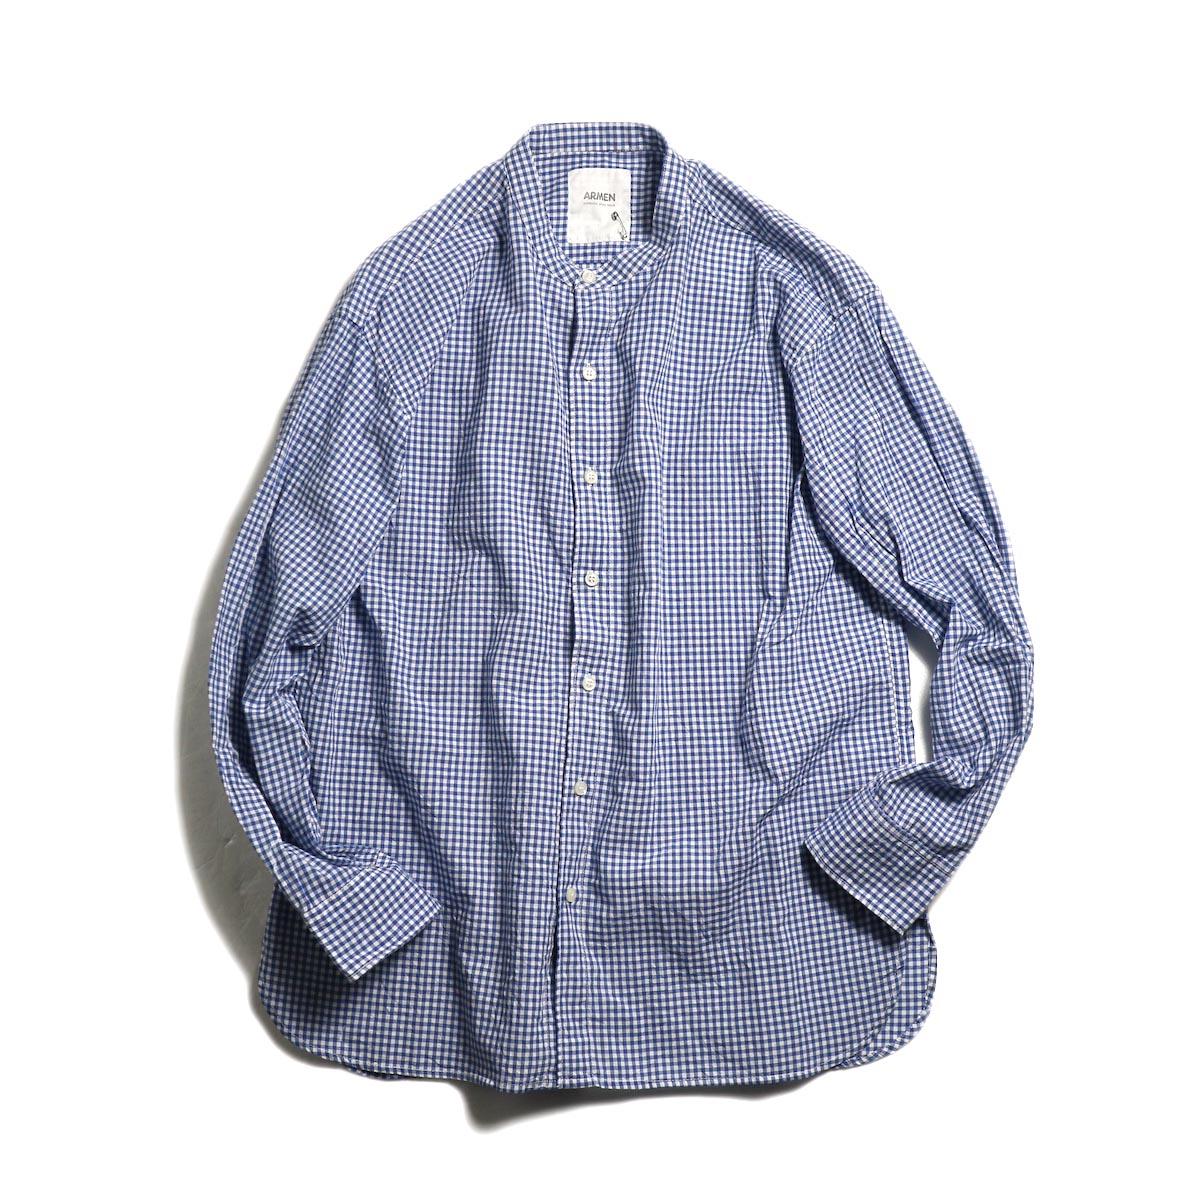 ARMEN / Utility Banded Collar Shirt -Gingham Check